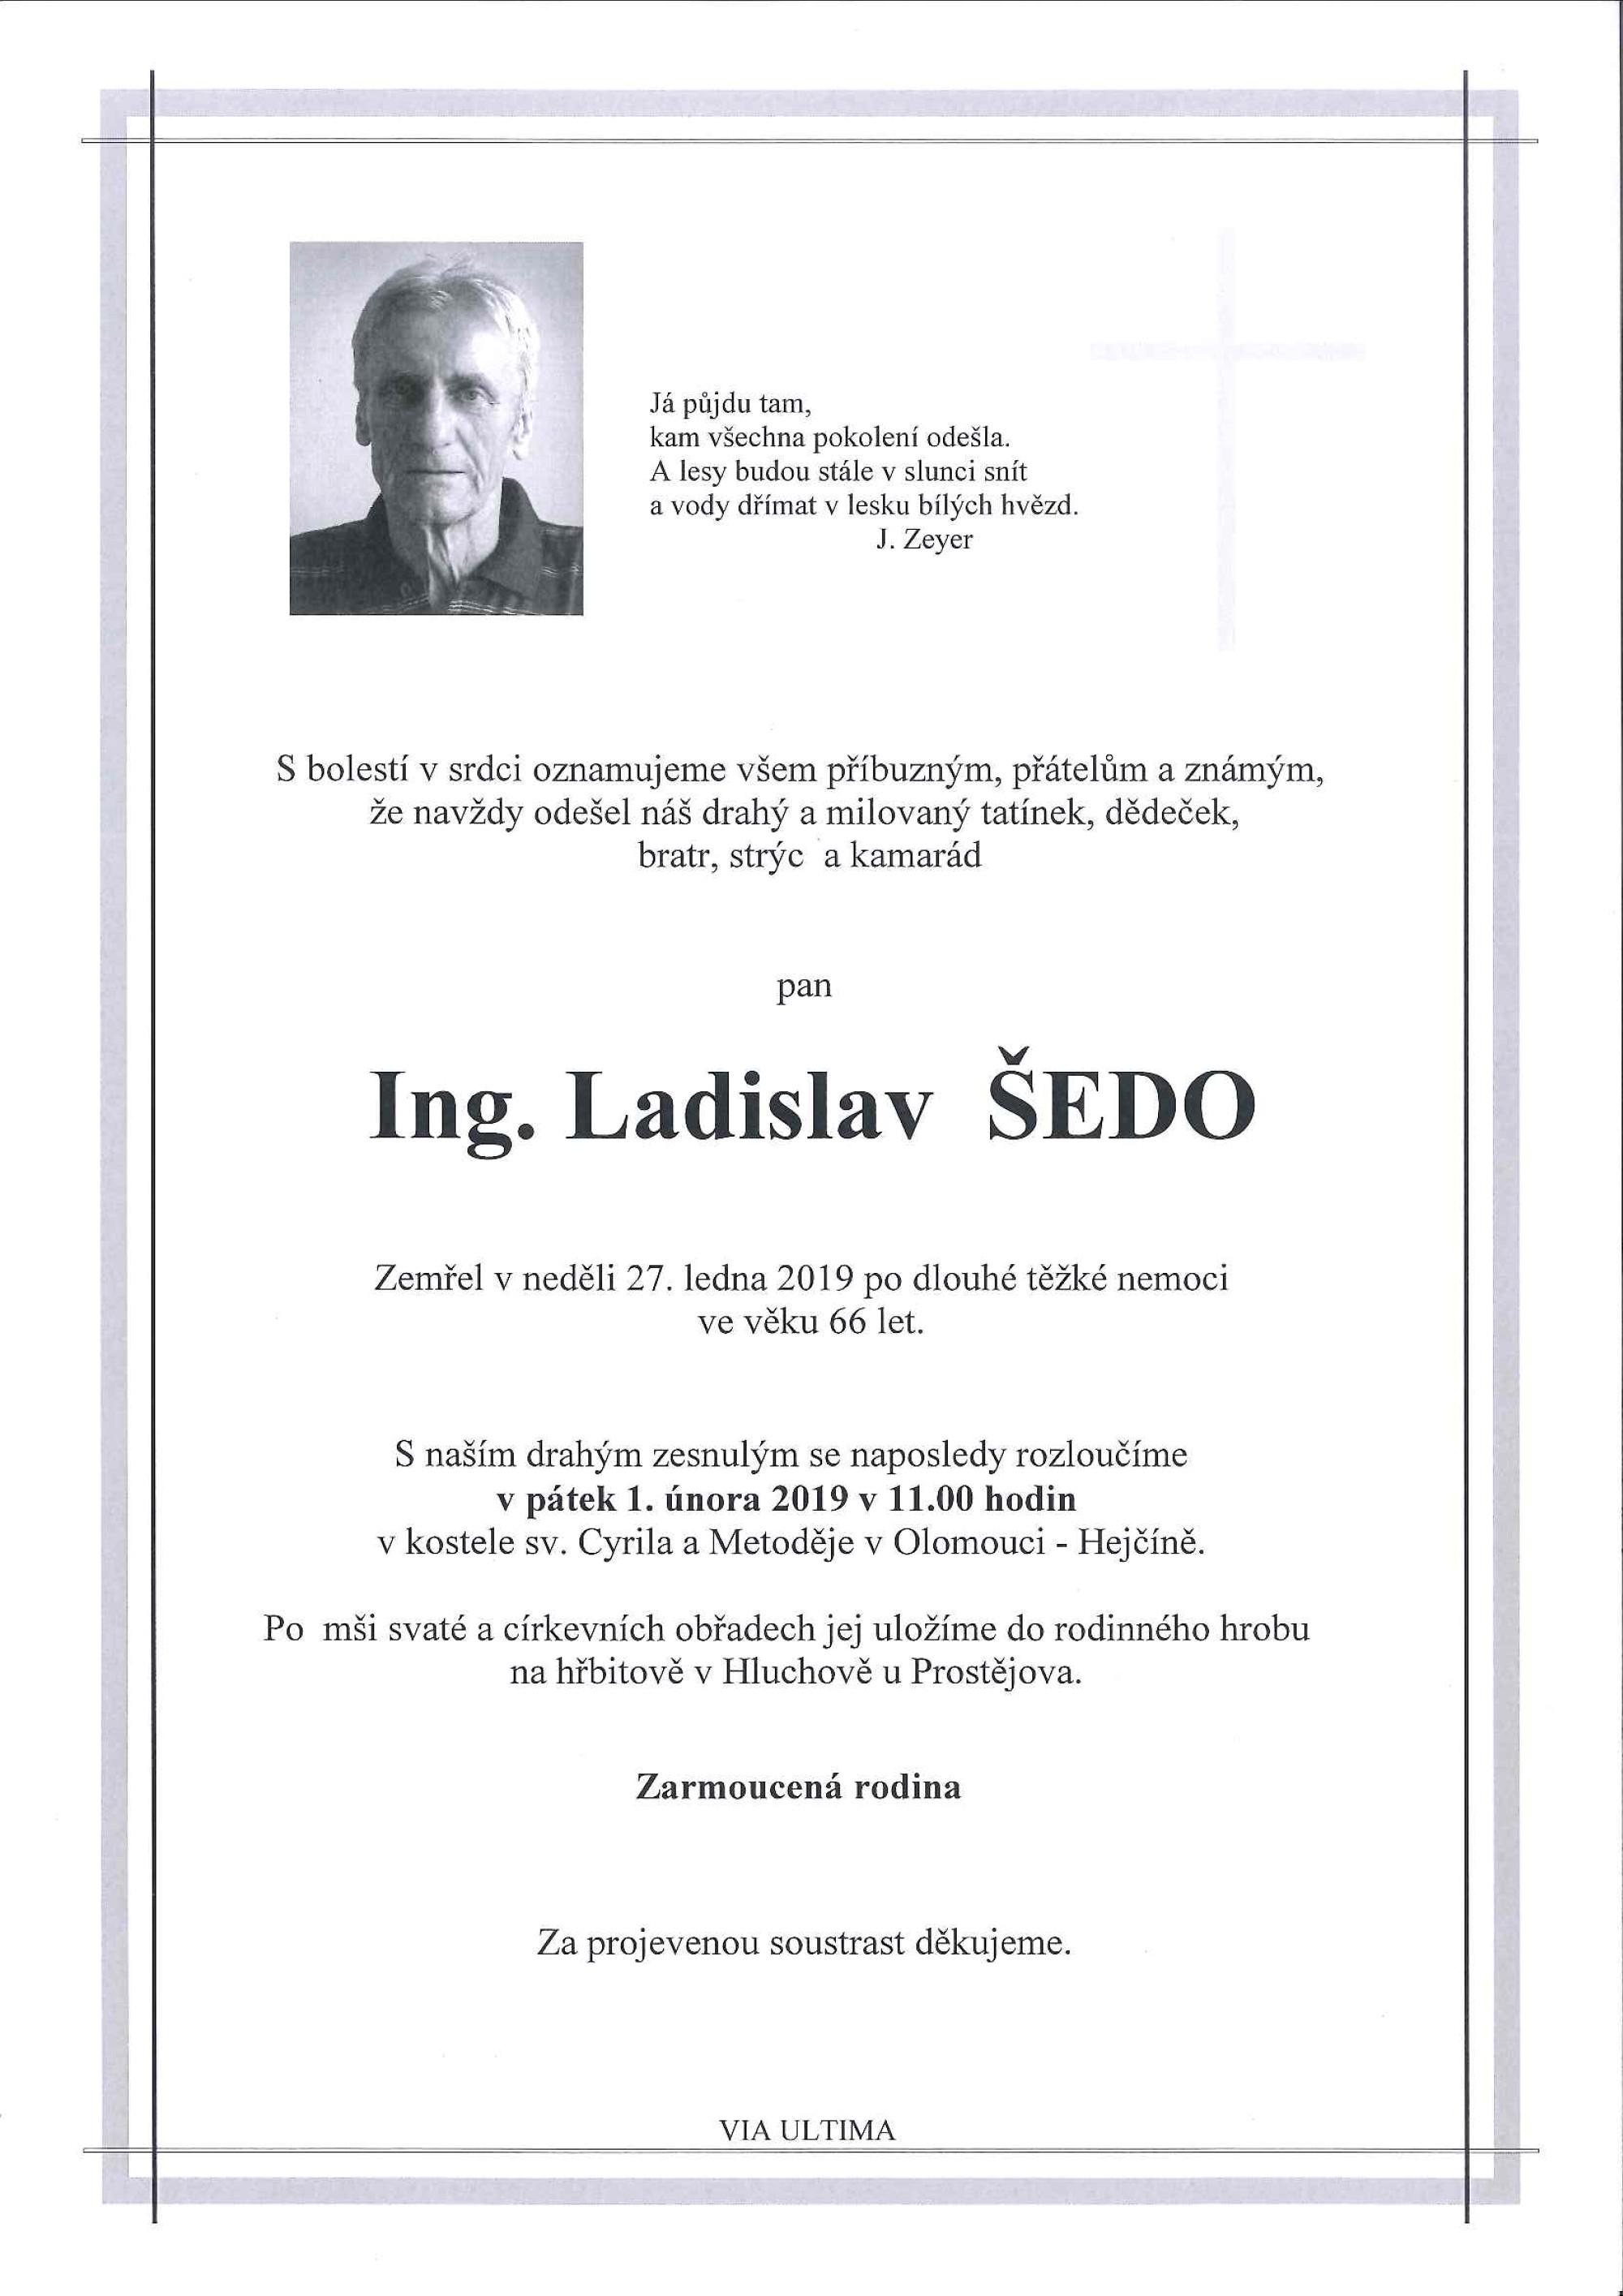 Ing. Ladislav Šedo